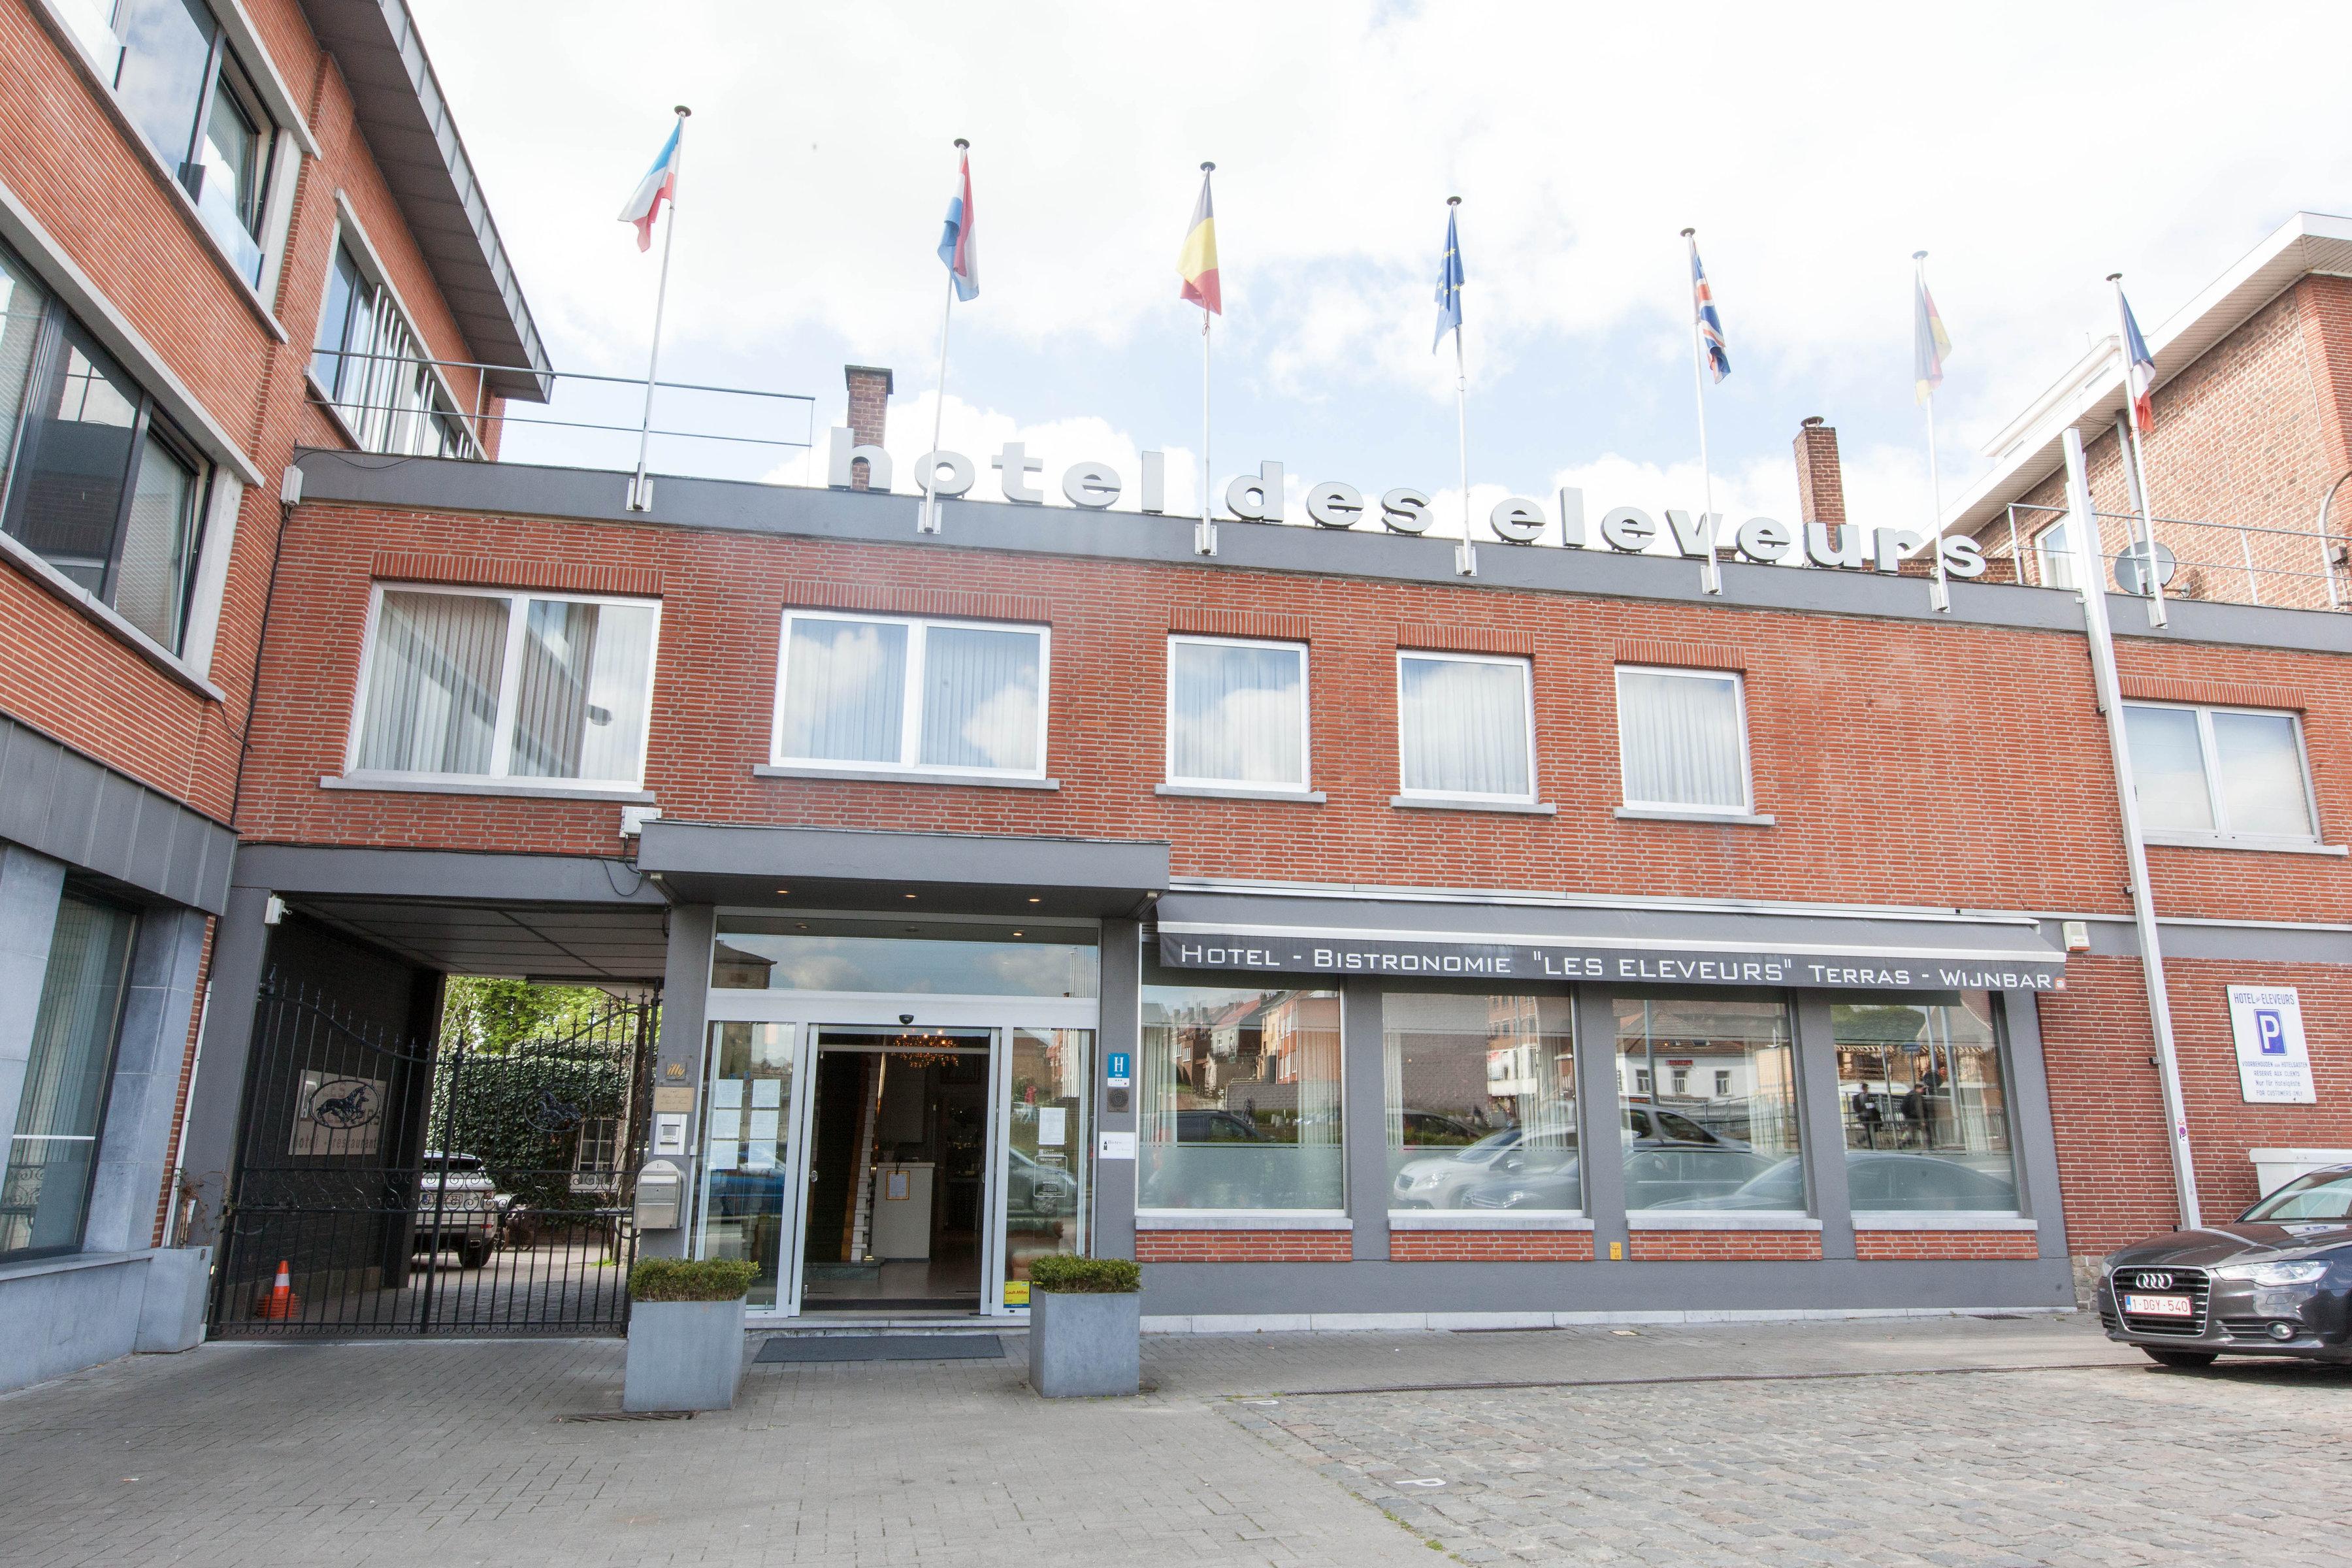 Hotel-Restaurant Les Eleveurs